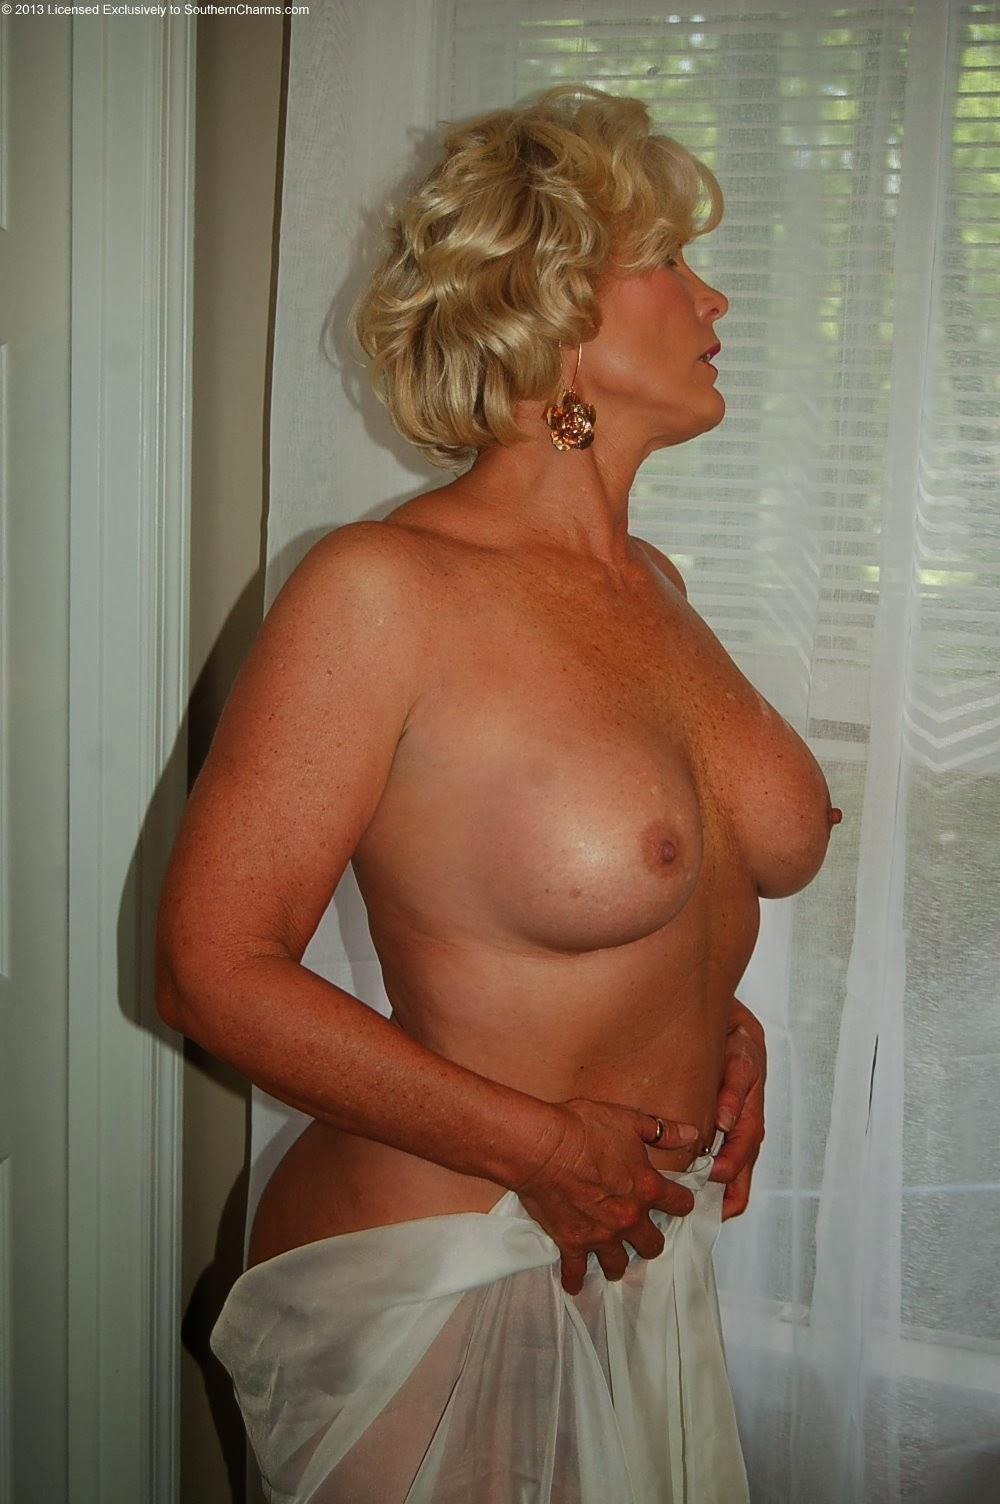 bibette southerncharm tubezzz porn photos